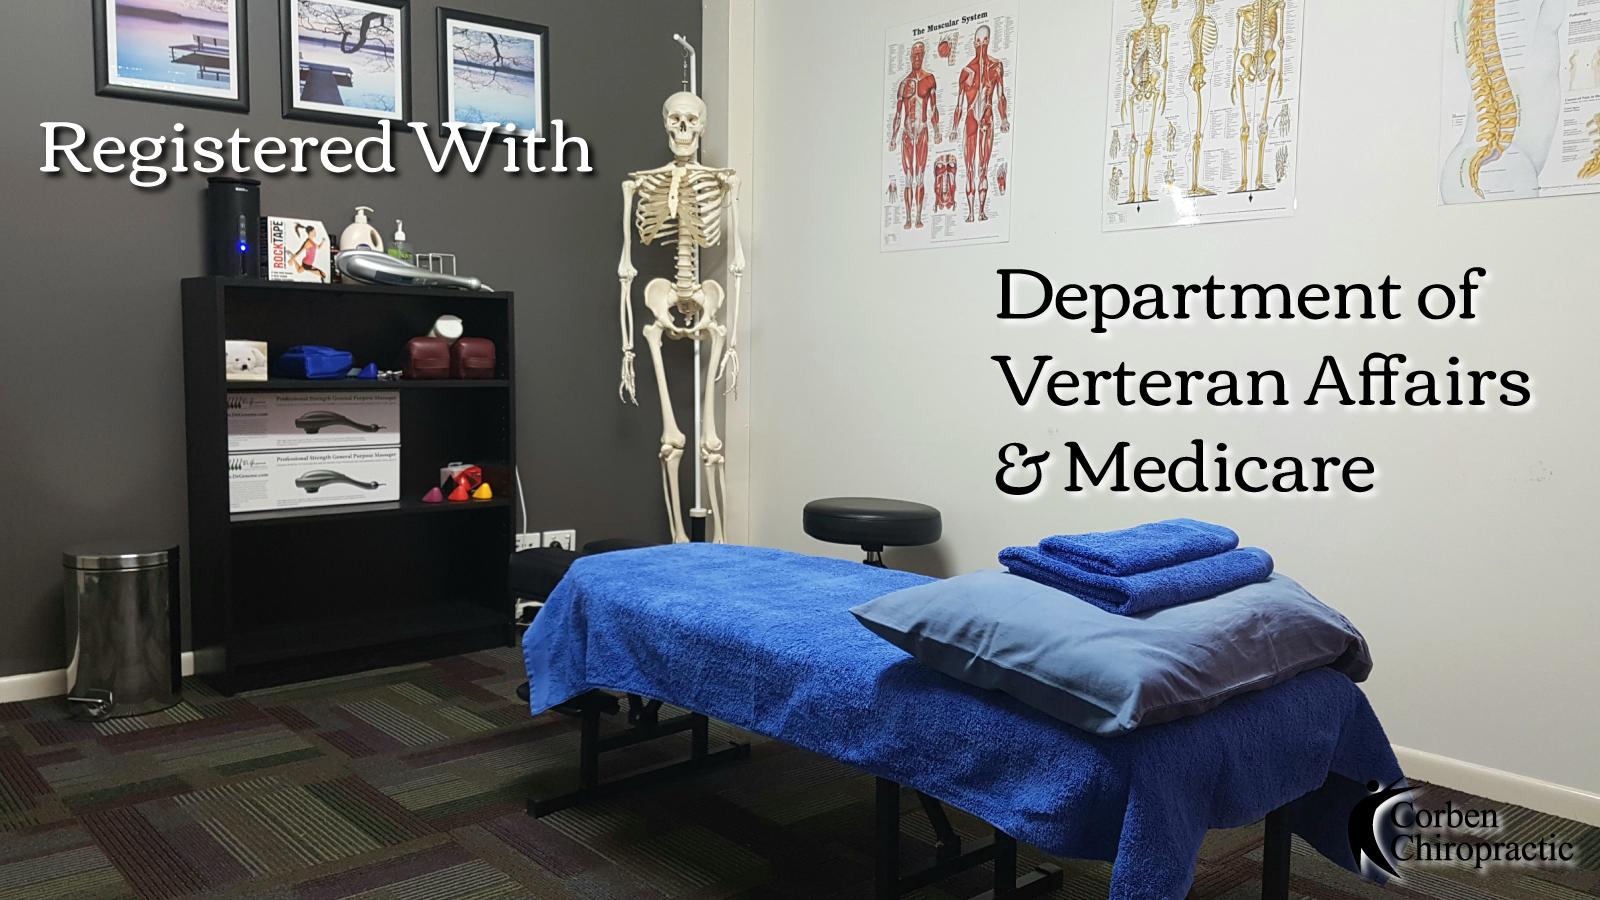 DVA and Medicare